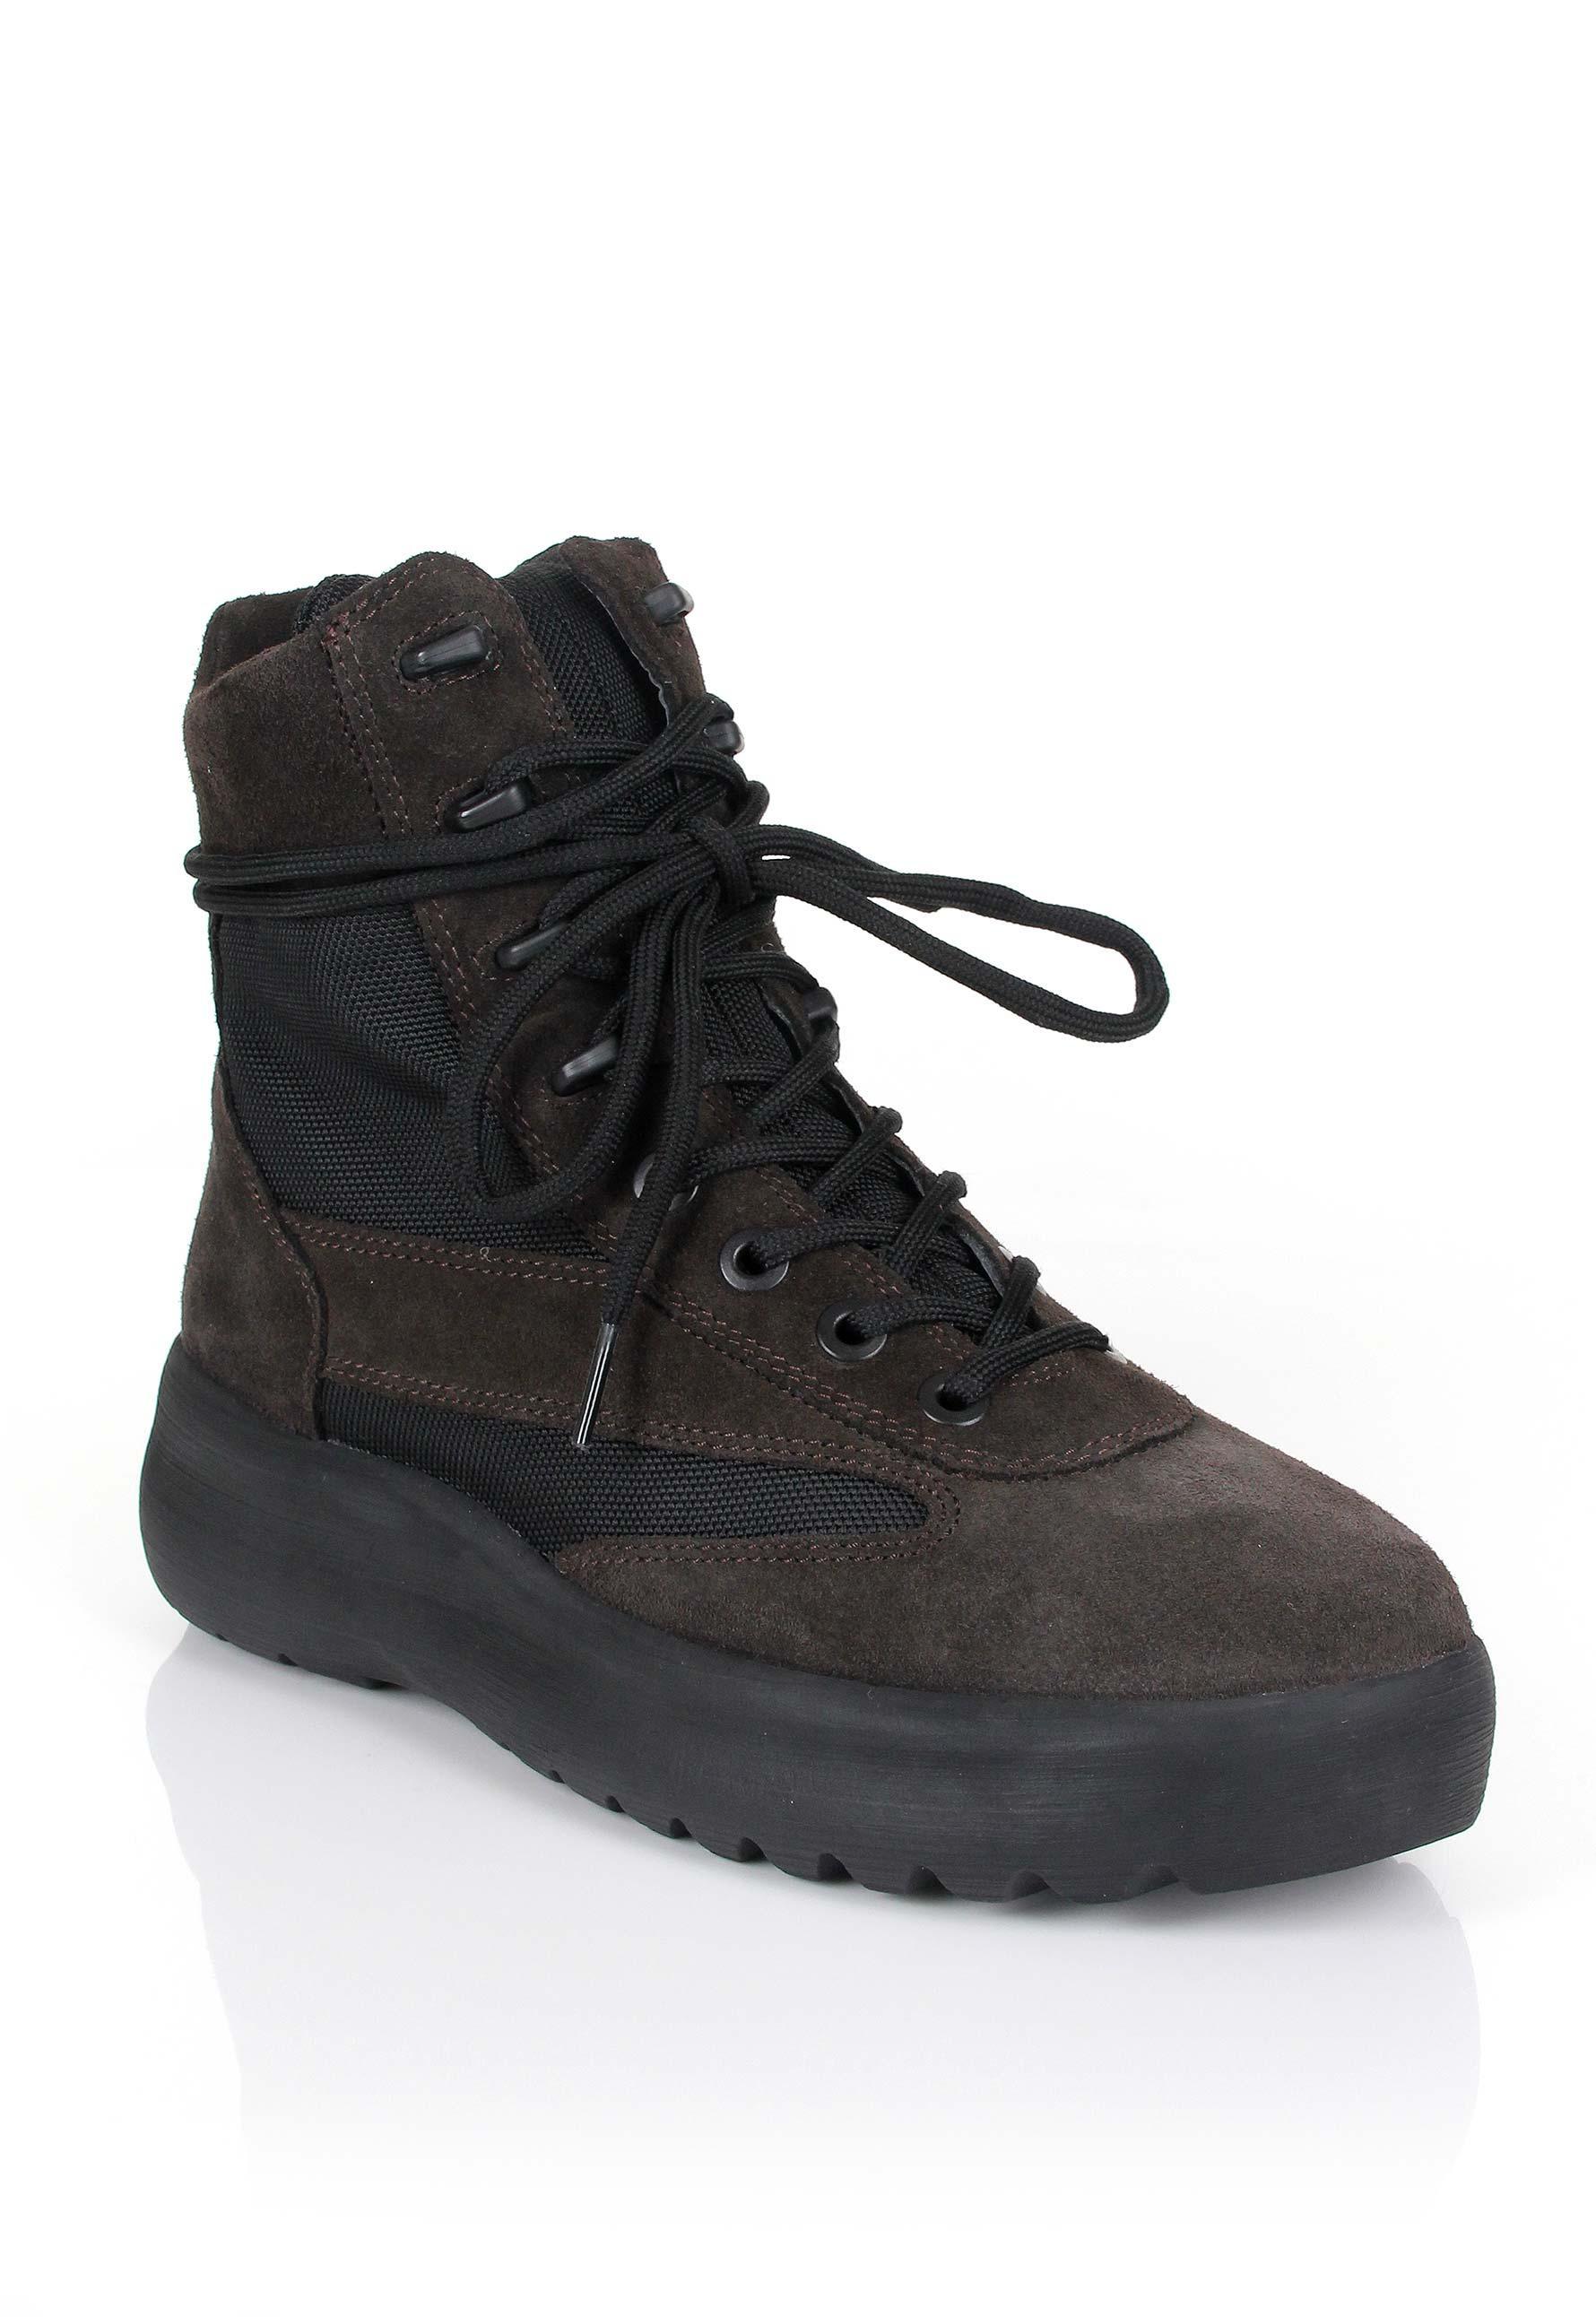 ebc17aaecabaf Lyst - Yeezy Season 5 Military Boots Oil in Black for Men